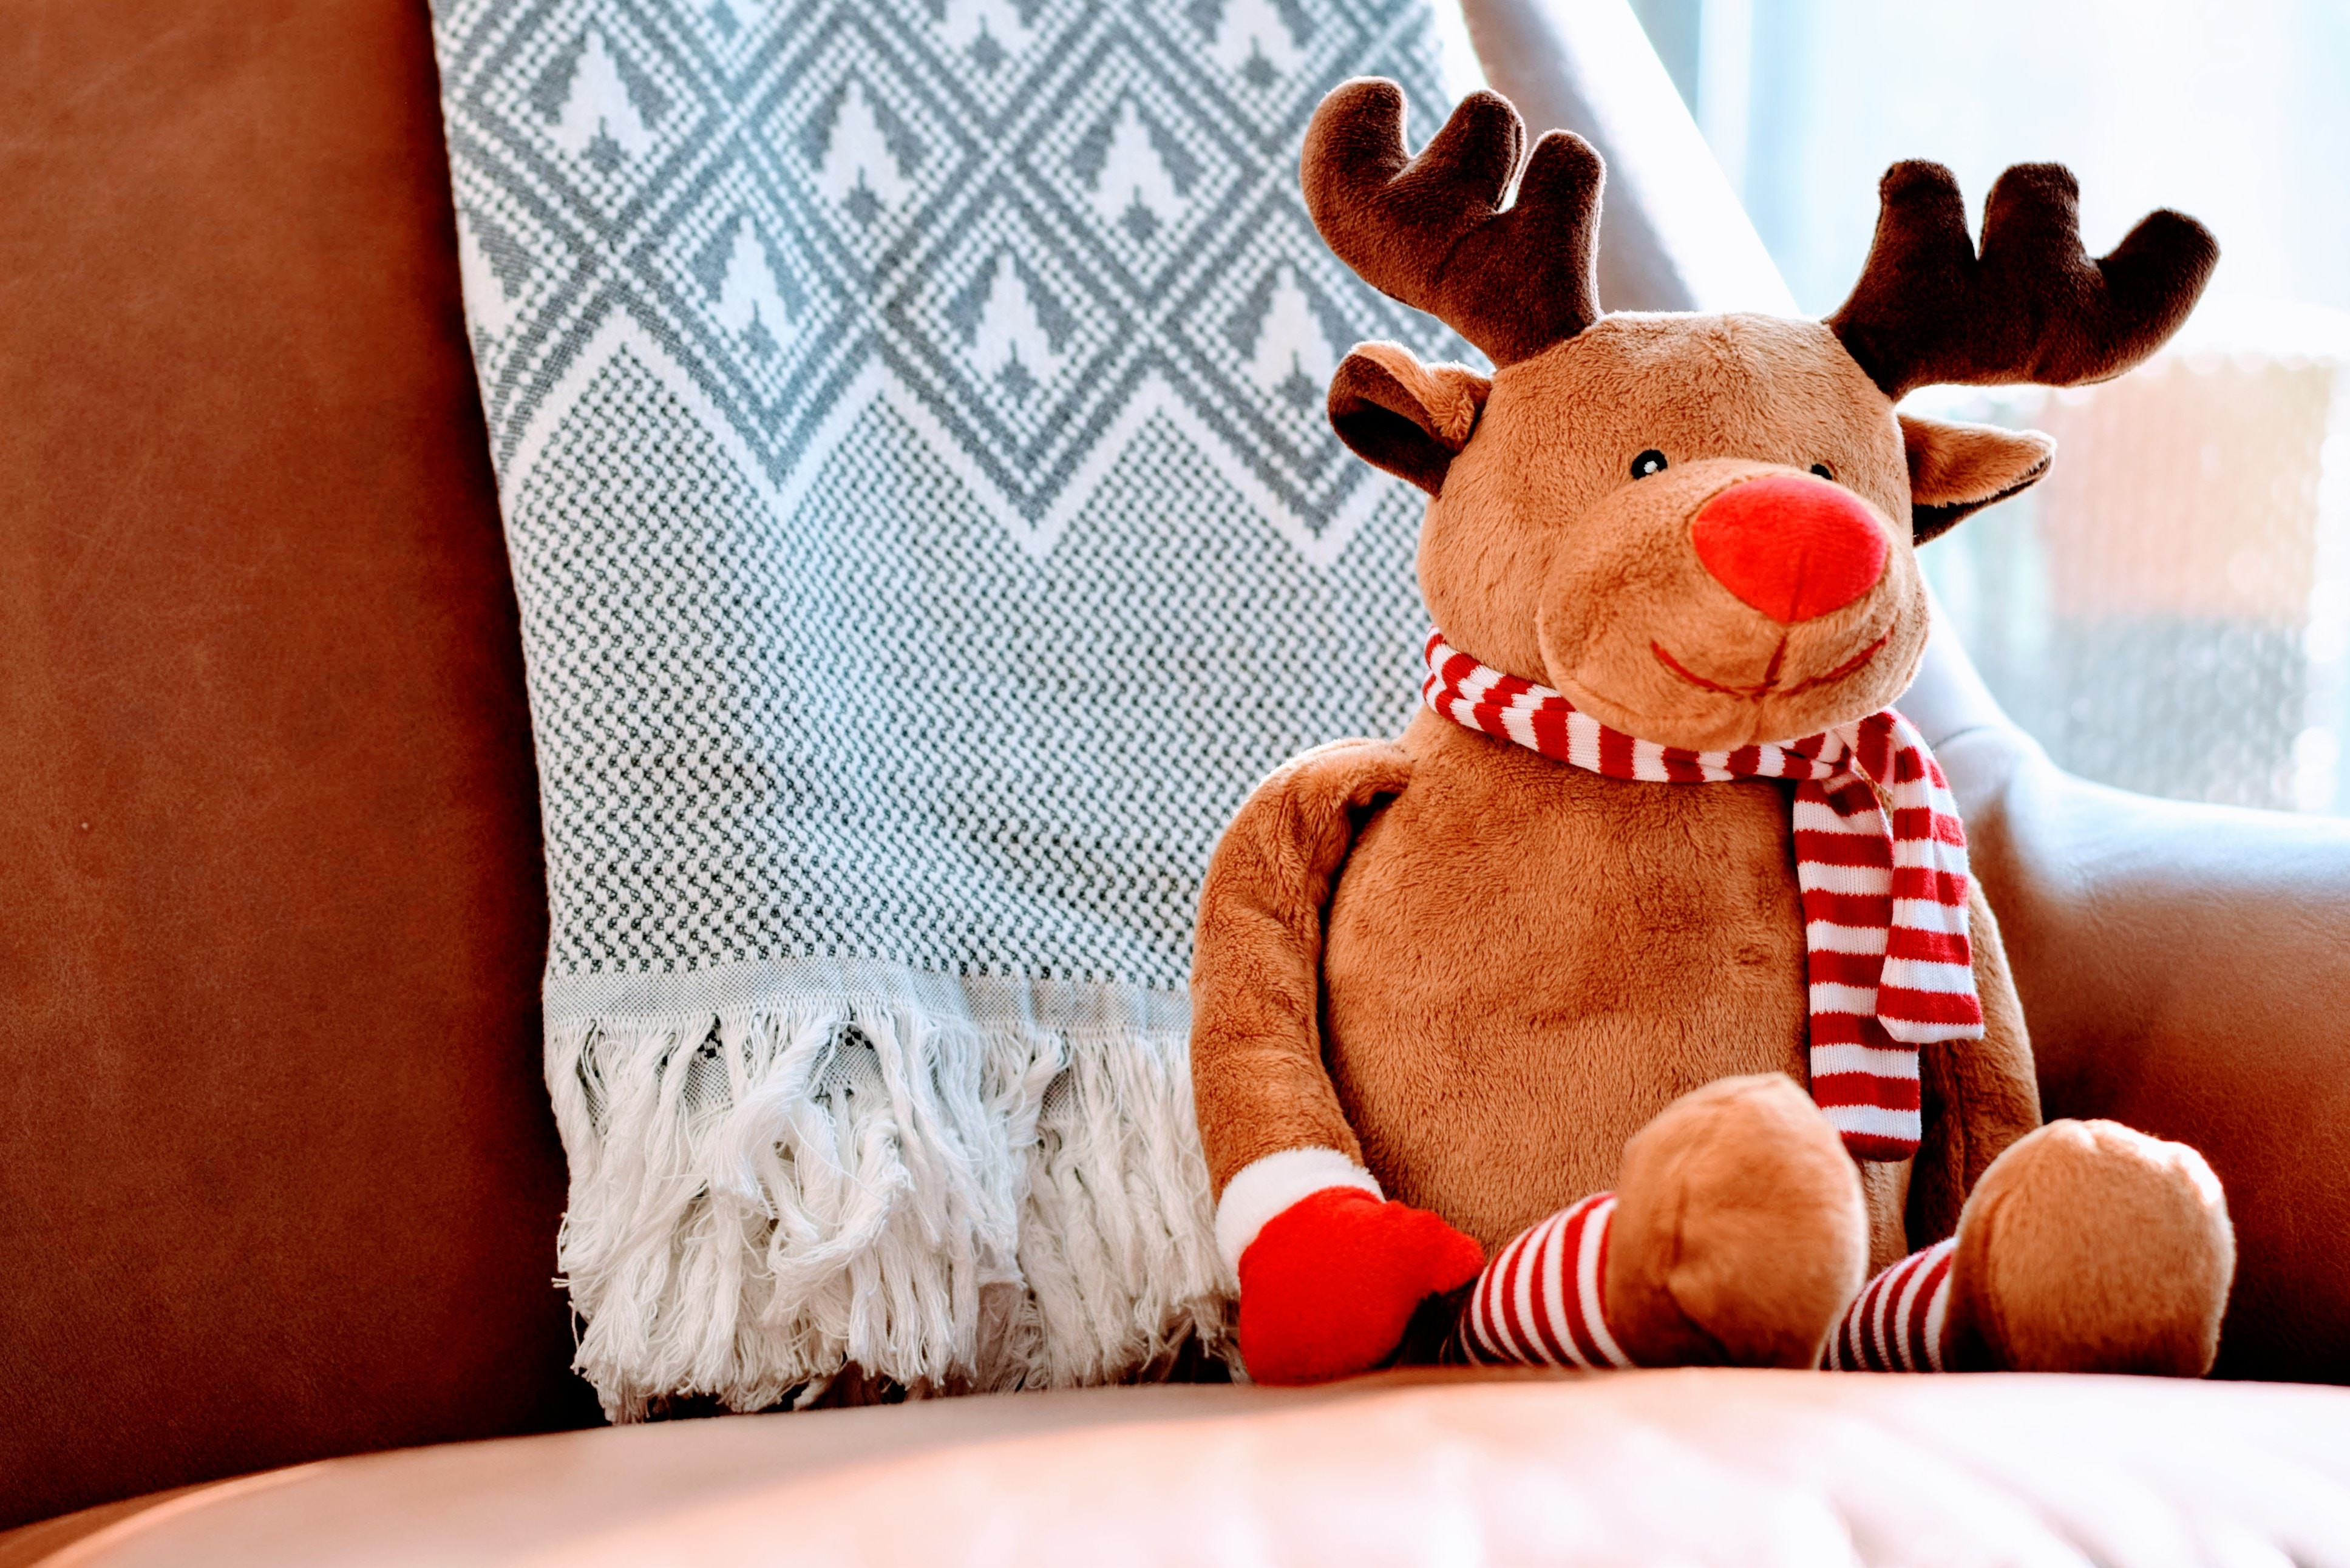 The Rudolf